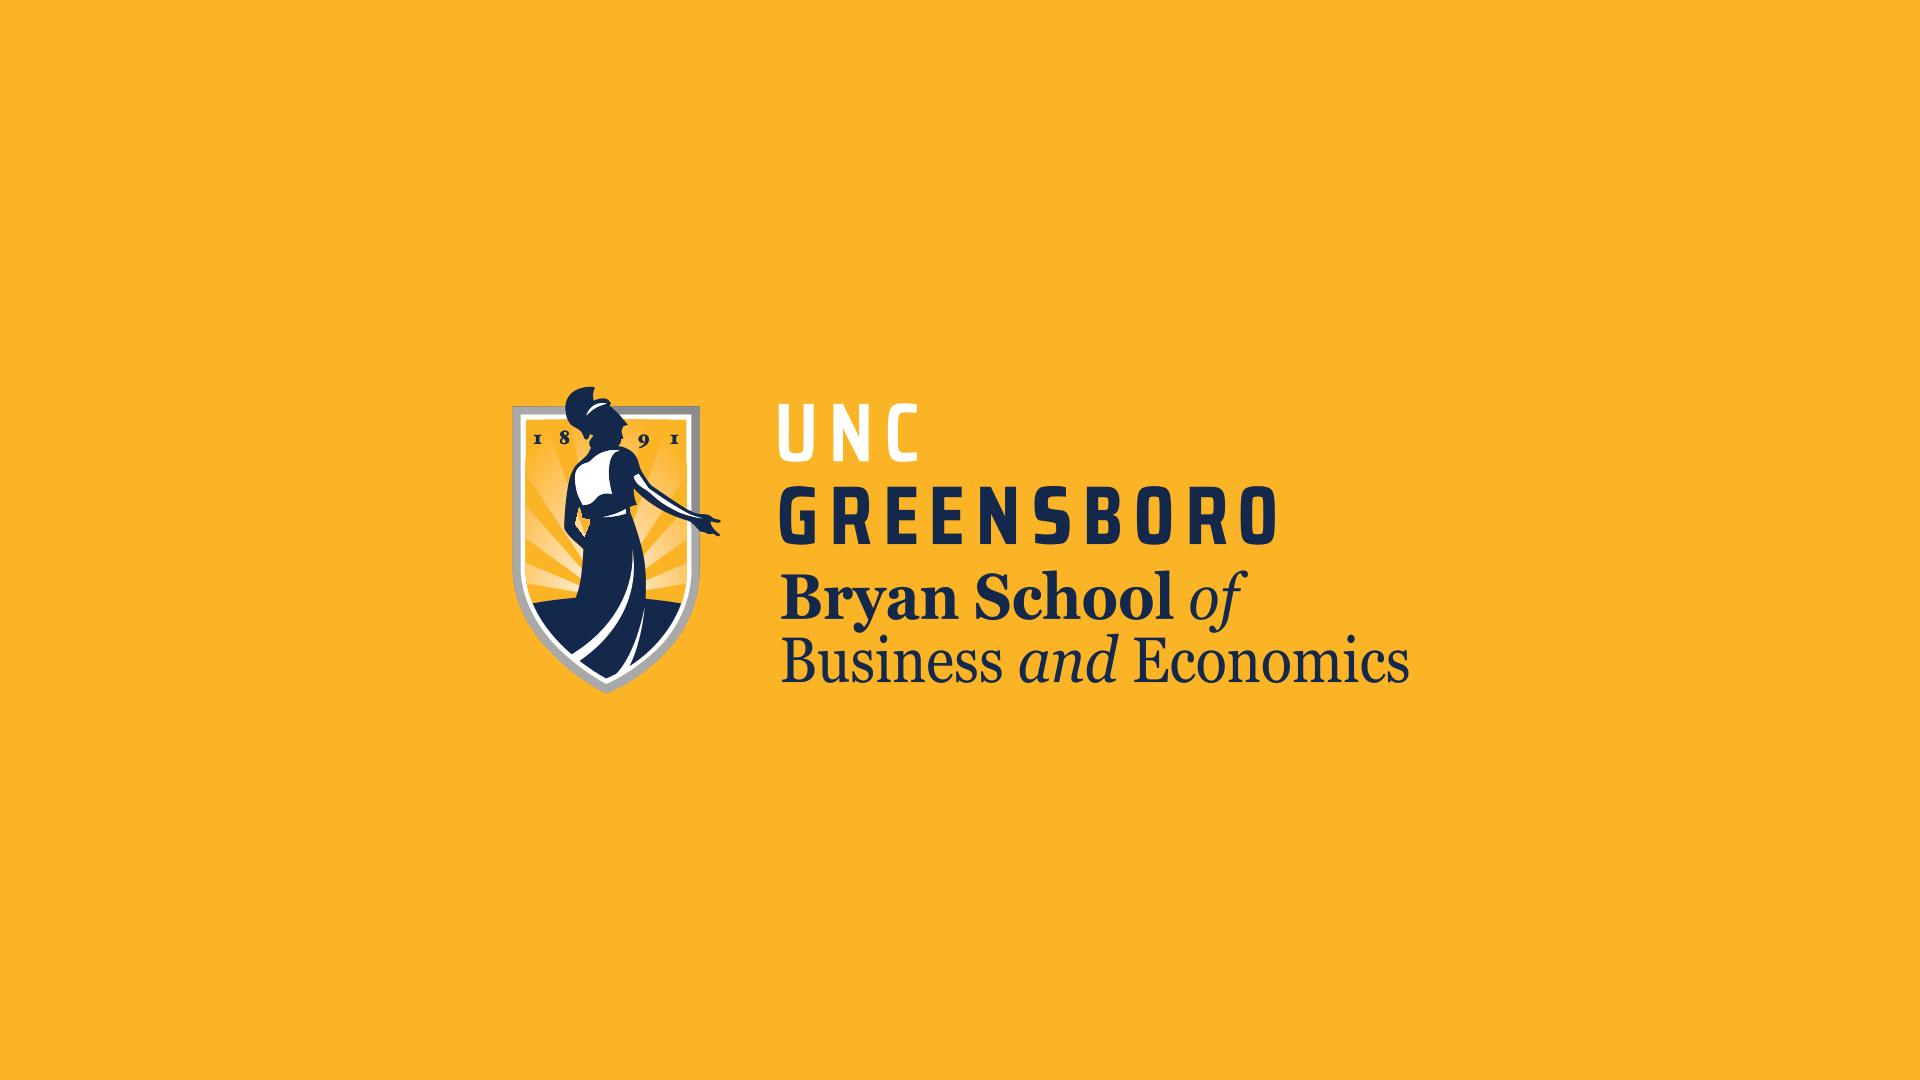 UNCG service company logo